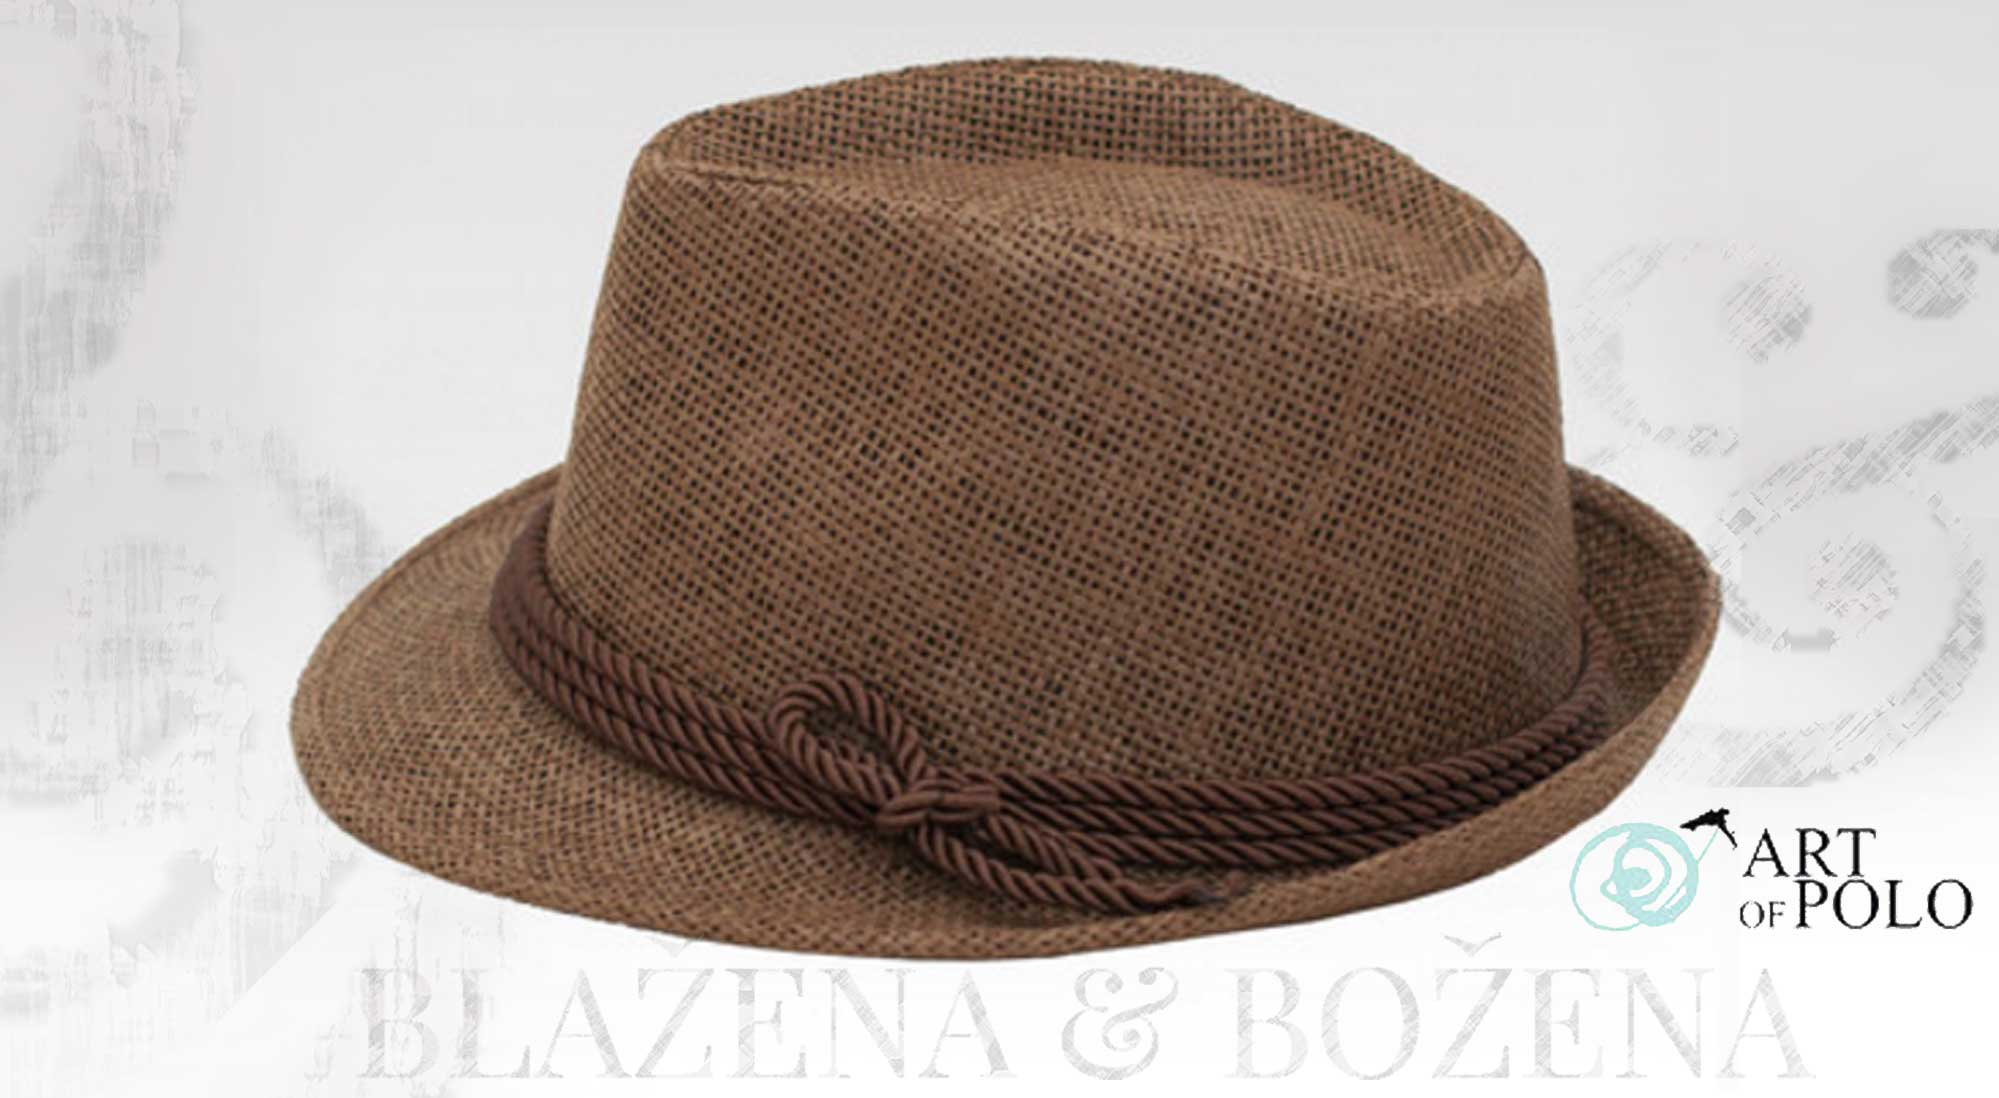 Getafe – hnědý plážový klobouk – Blažena Božena 572a0ed556